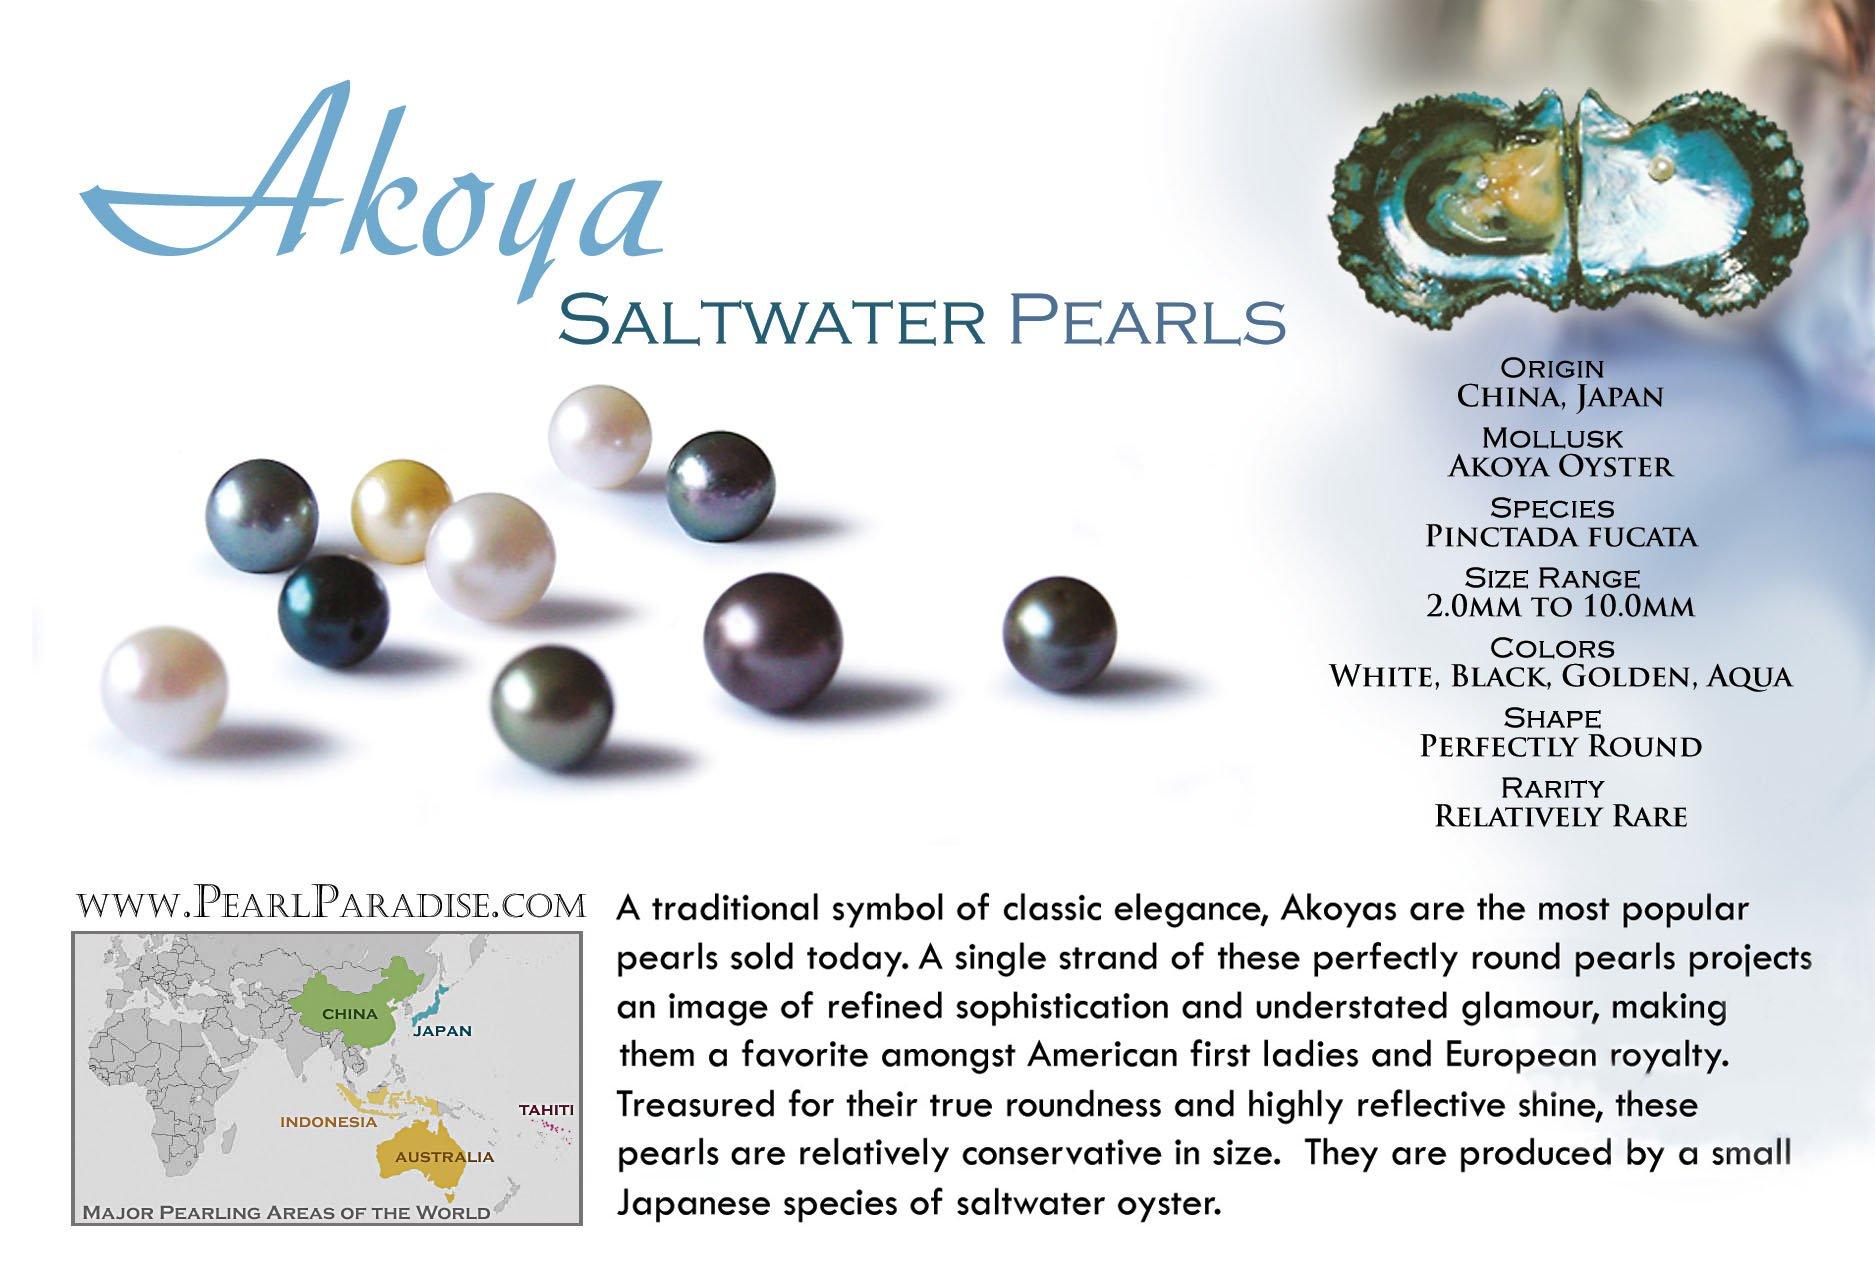 14k Akoya Cultured Pearl Earrings Top Gem Quality 7.0-7.5 mm White (White Gold)